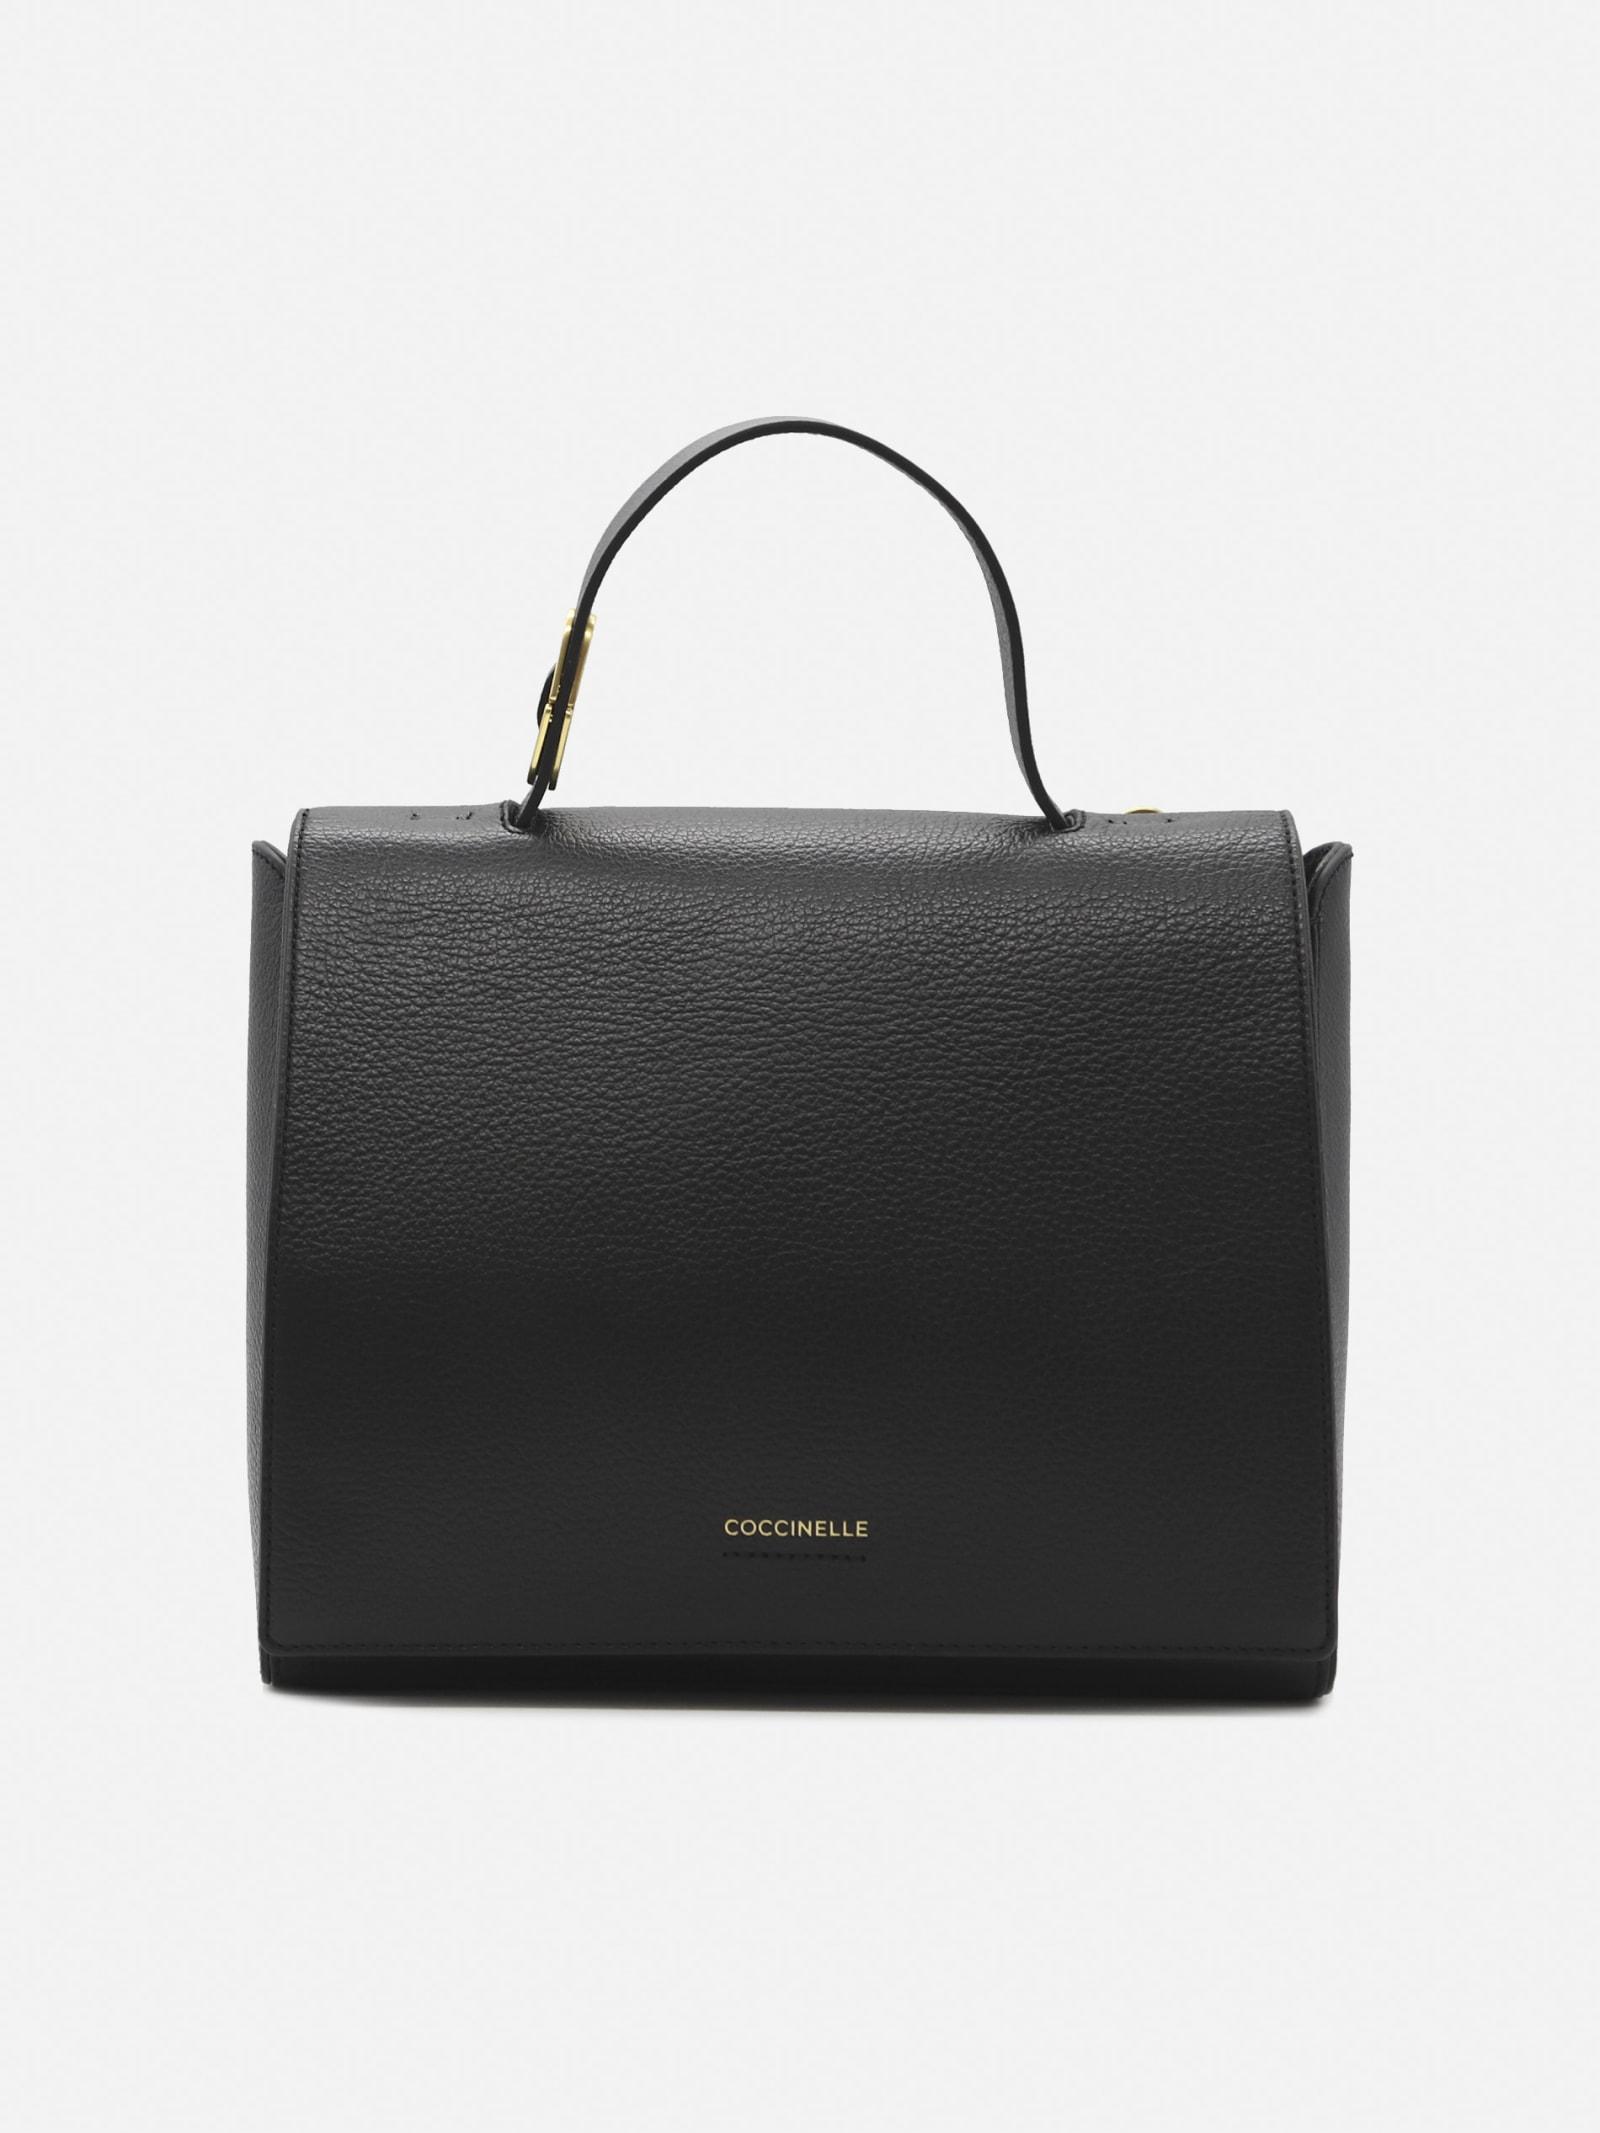 Josephine Handbag In Grained Leather